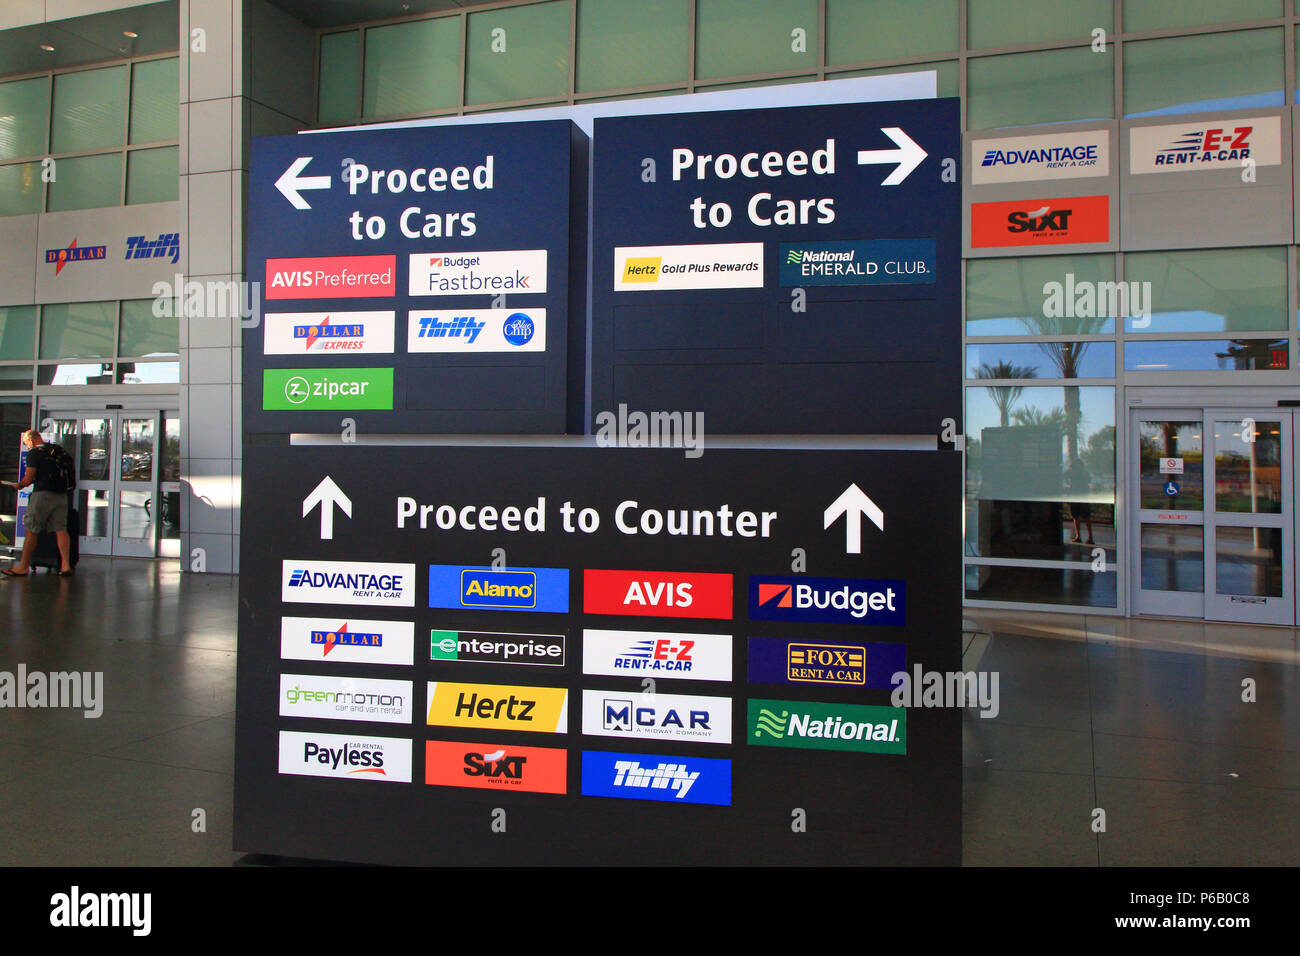 Avis Car Rental At Gold Coast Airport